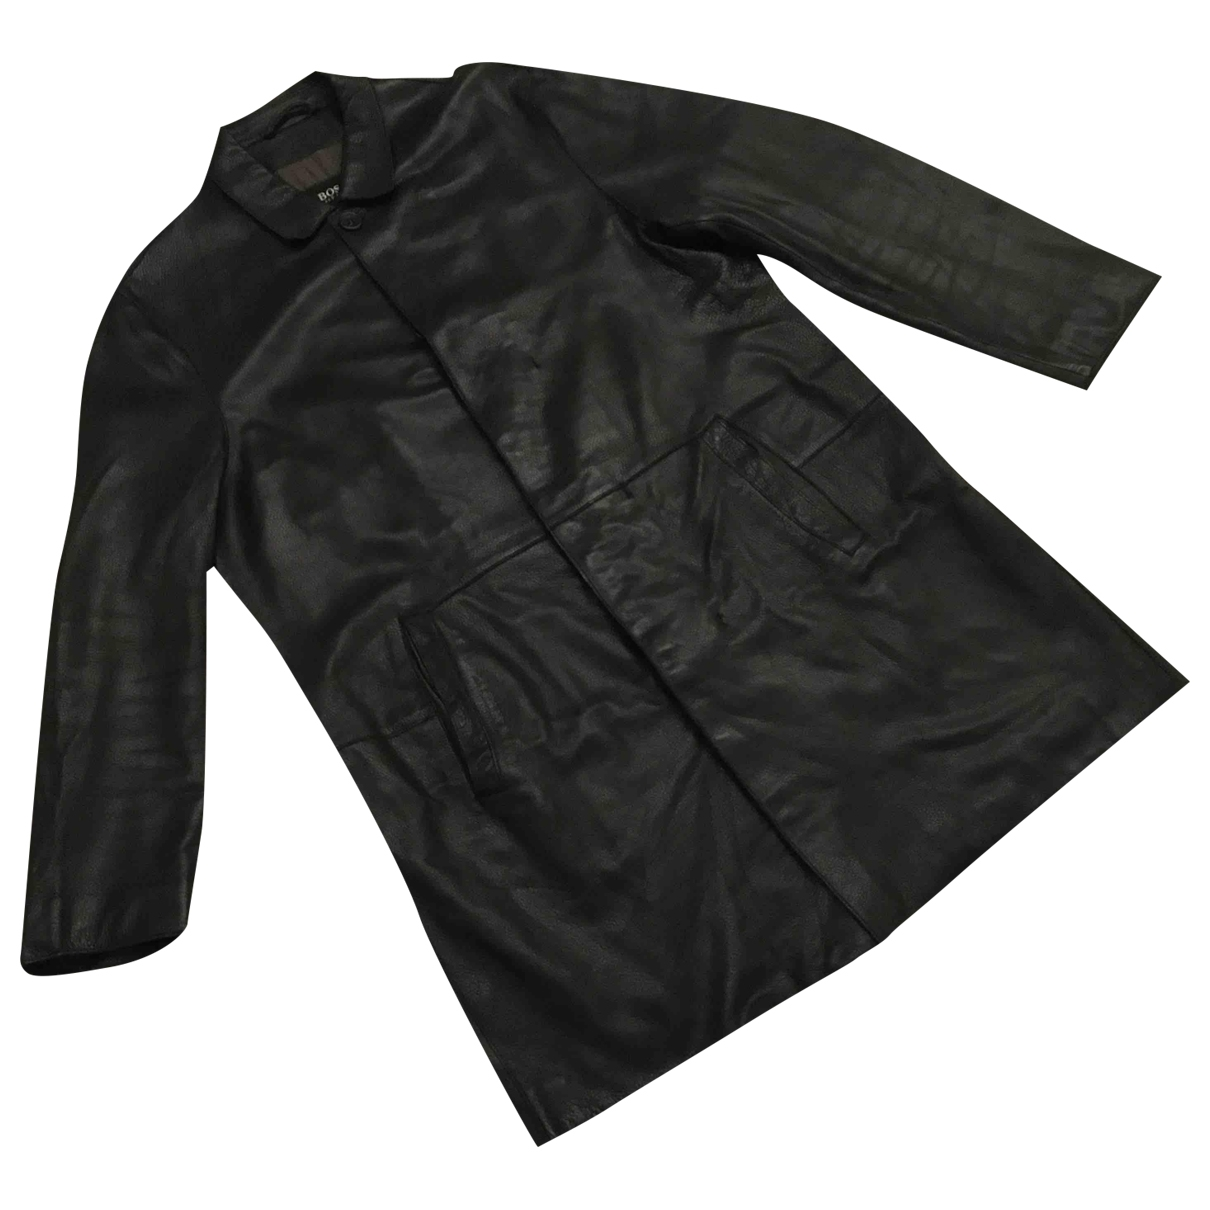 Boss \N Black Leather jacket  for Men L International